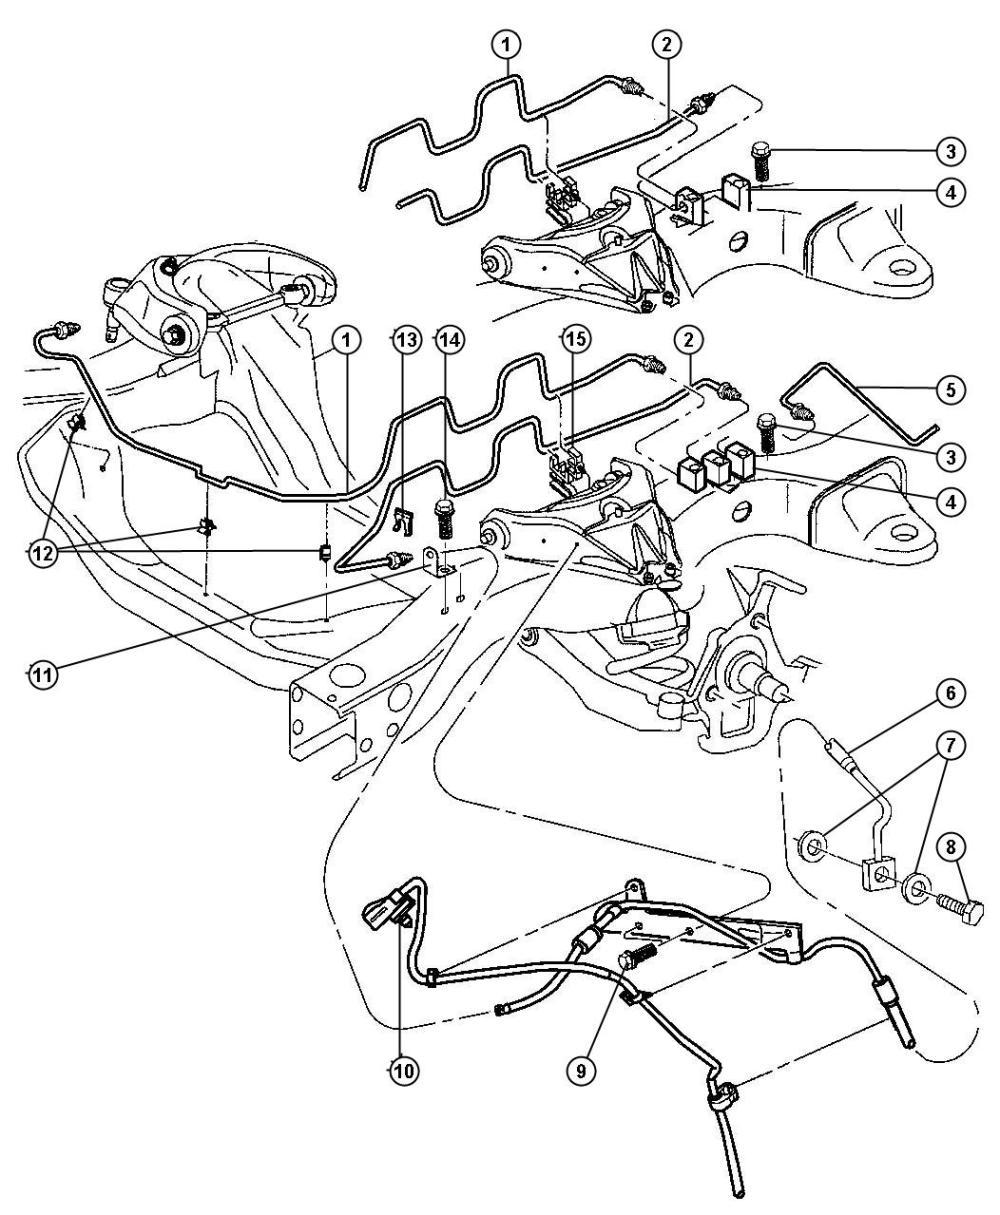 medium resolution of dodge dakota brake line diagram car interior design 2001 ford expedition brake line diagram dodge dakota rear brake diagram